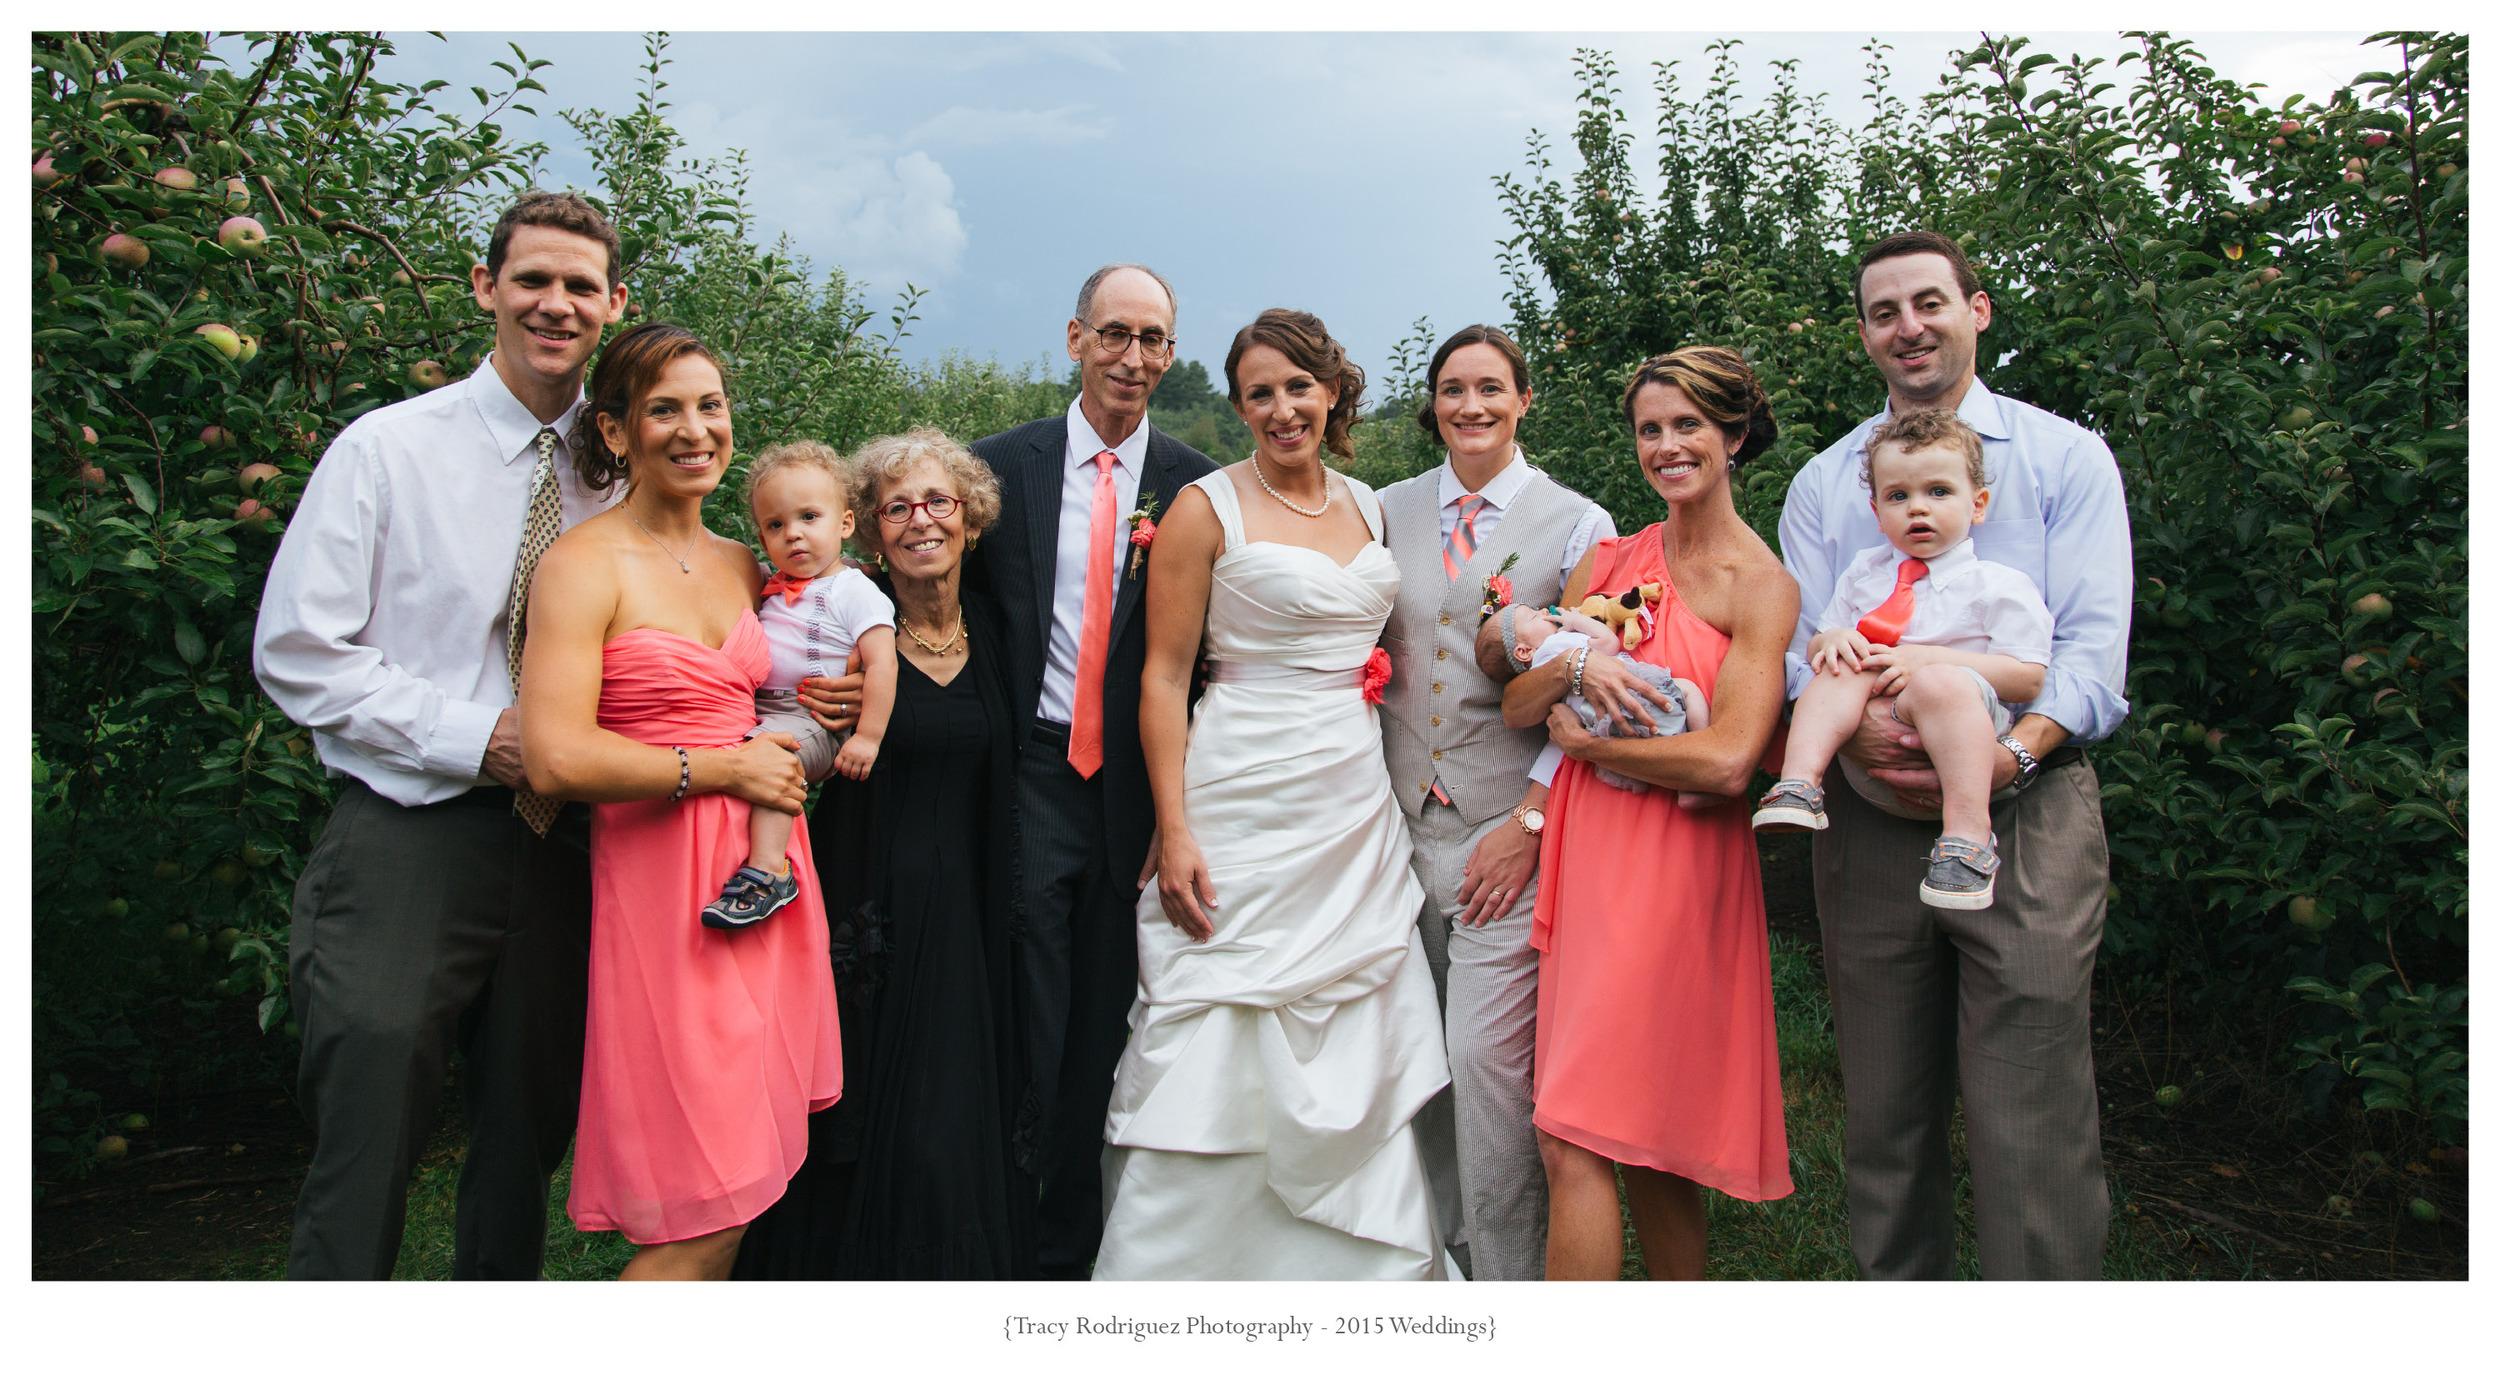 Slackberg Mock Wedding Album18.jpg